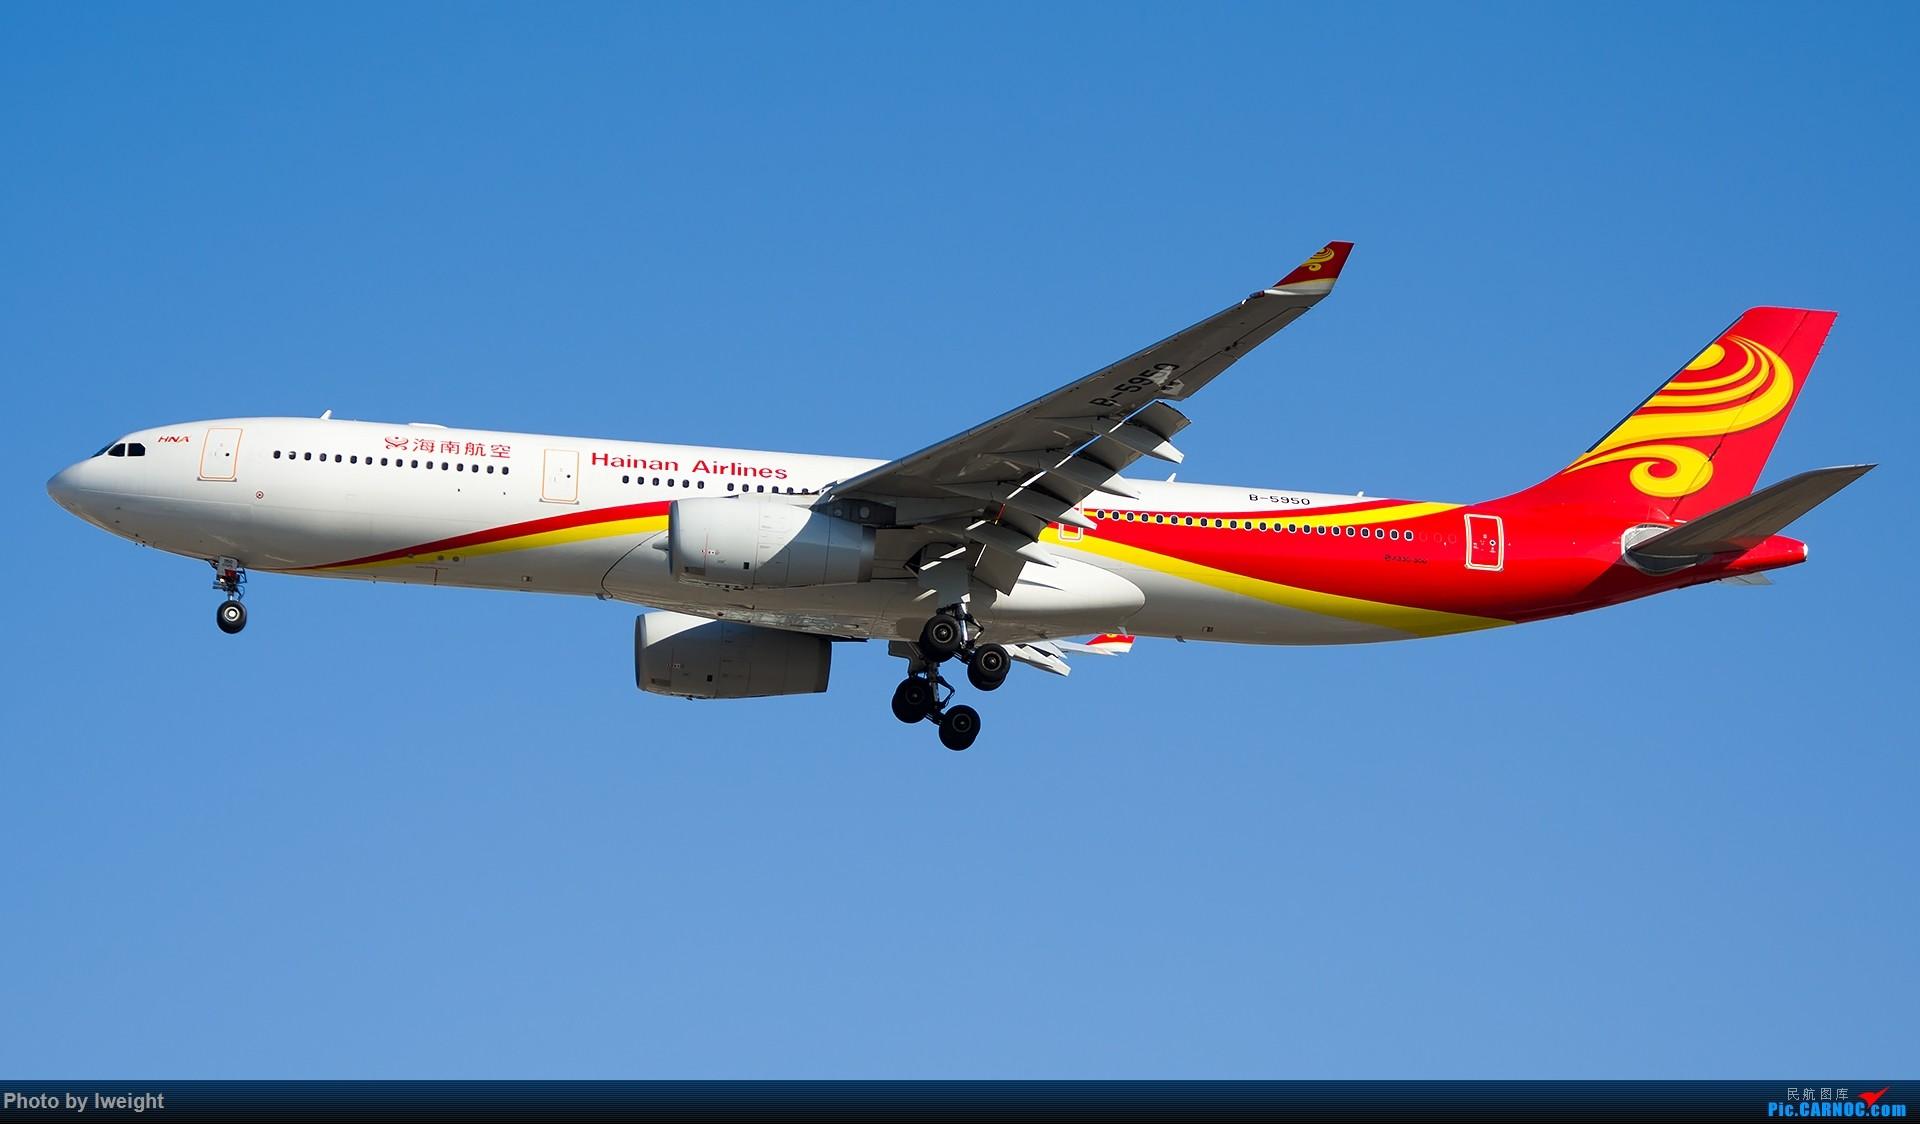 Re:[原创]北京难得的好天气,随手拍了一些渣图【2015-01-27】 AIRBUS A330-300 B-5950 中国北京首都国际机场